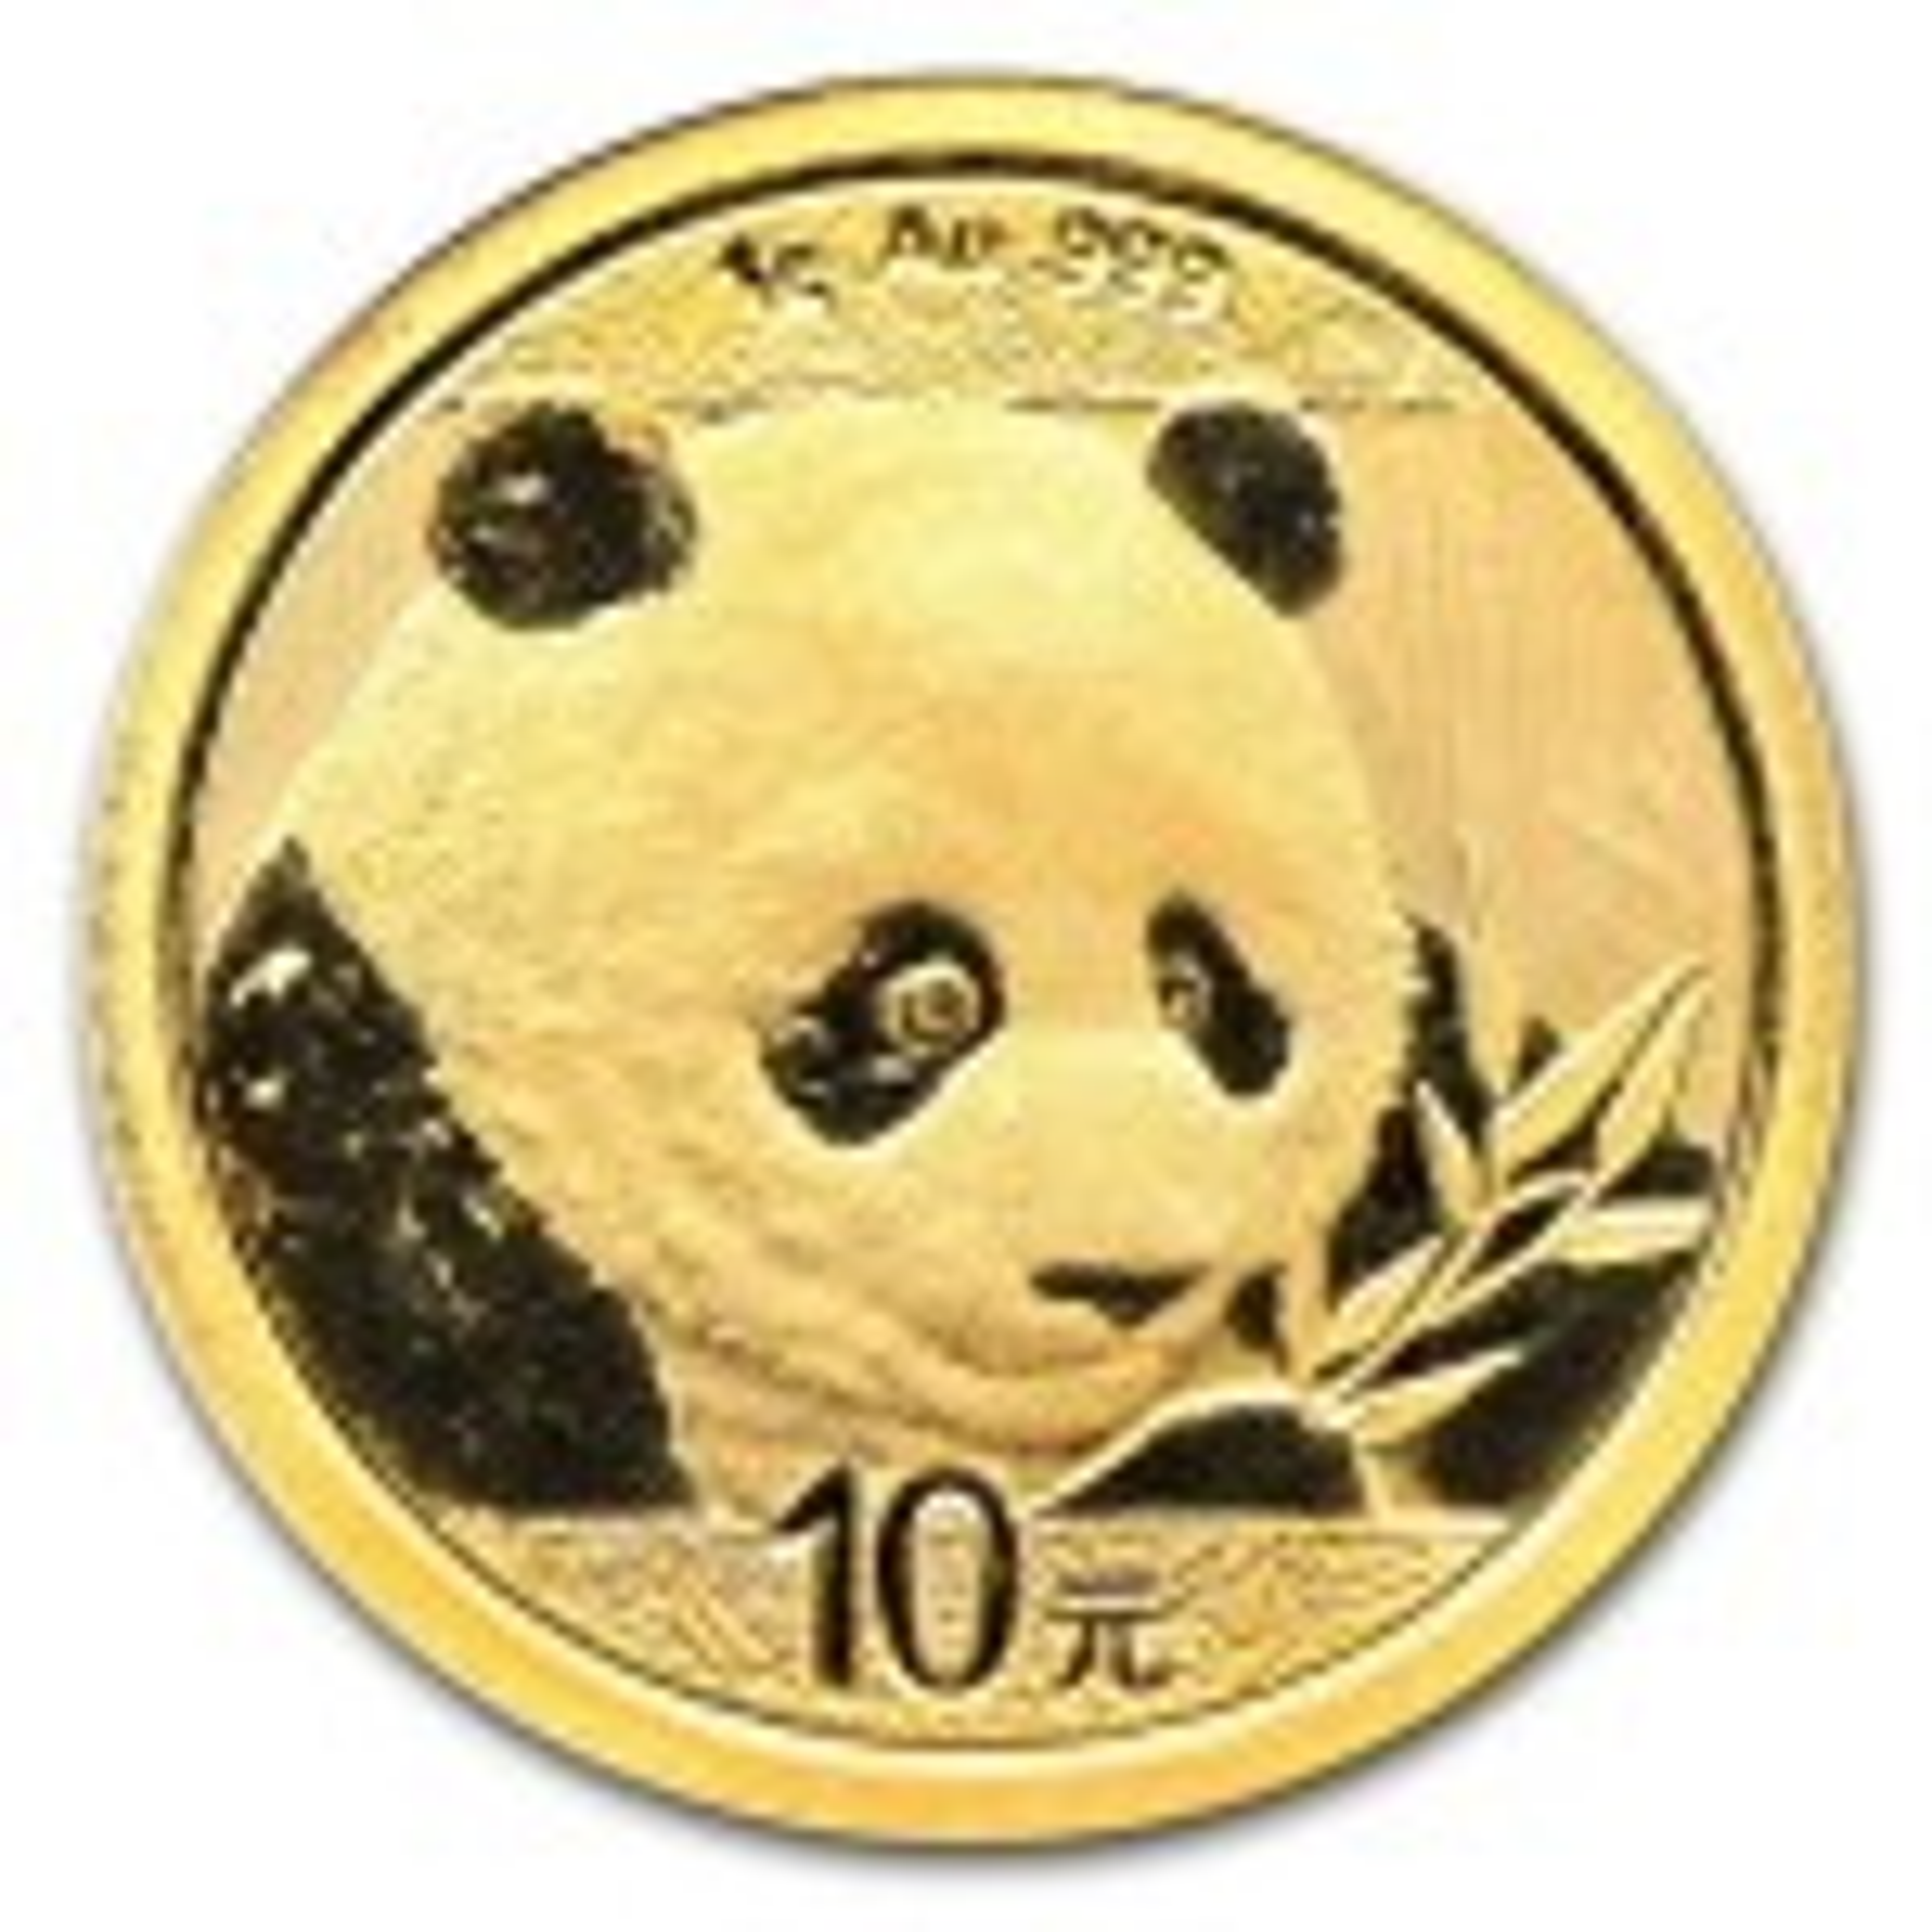 1 Gram gouden Panda munt 2018